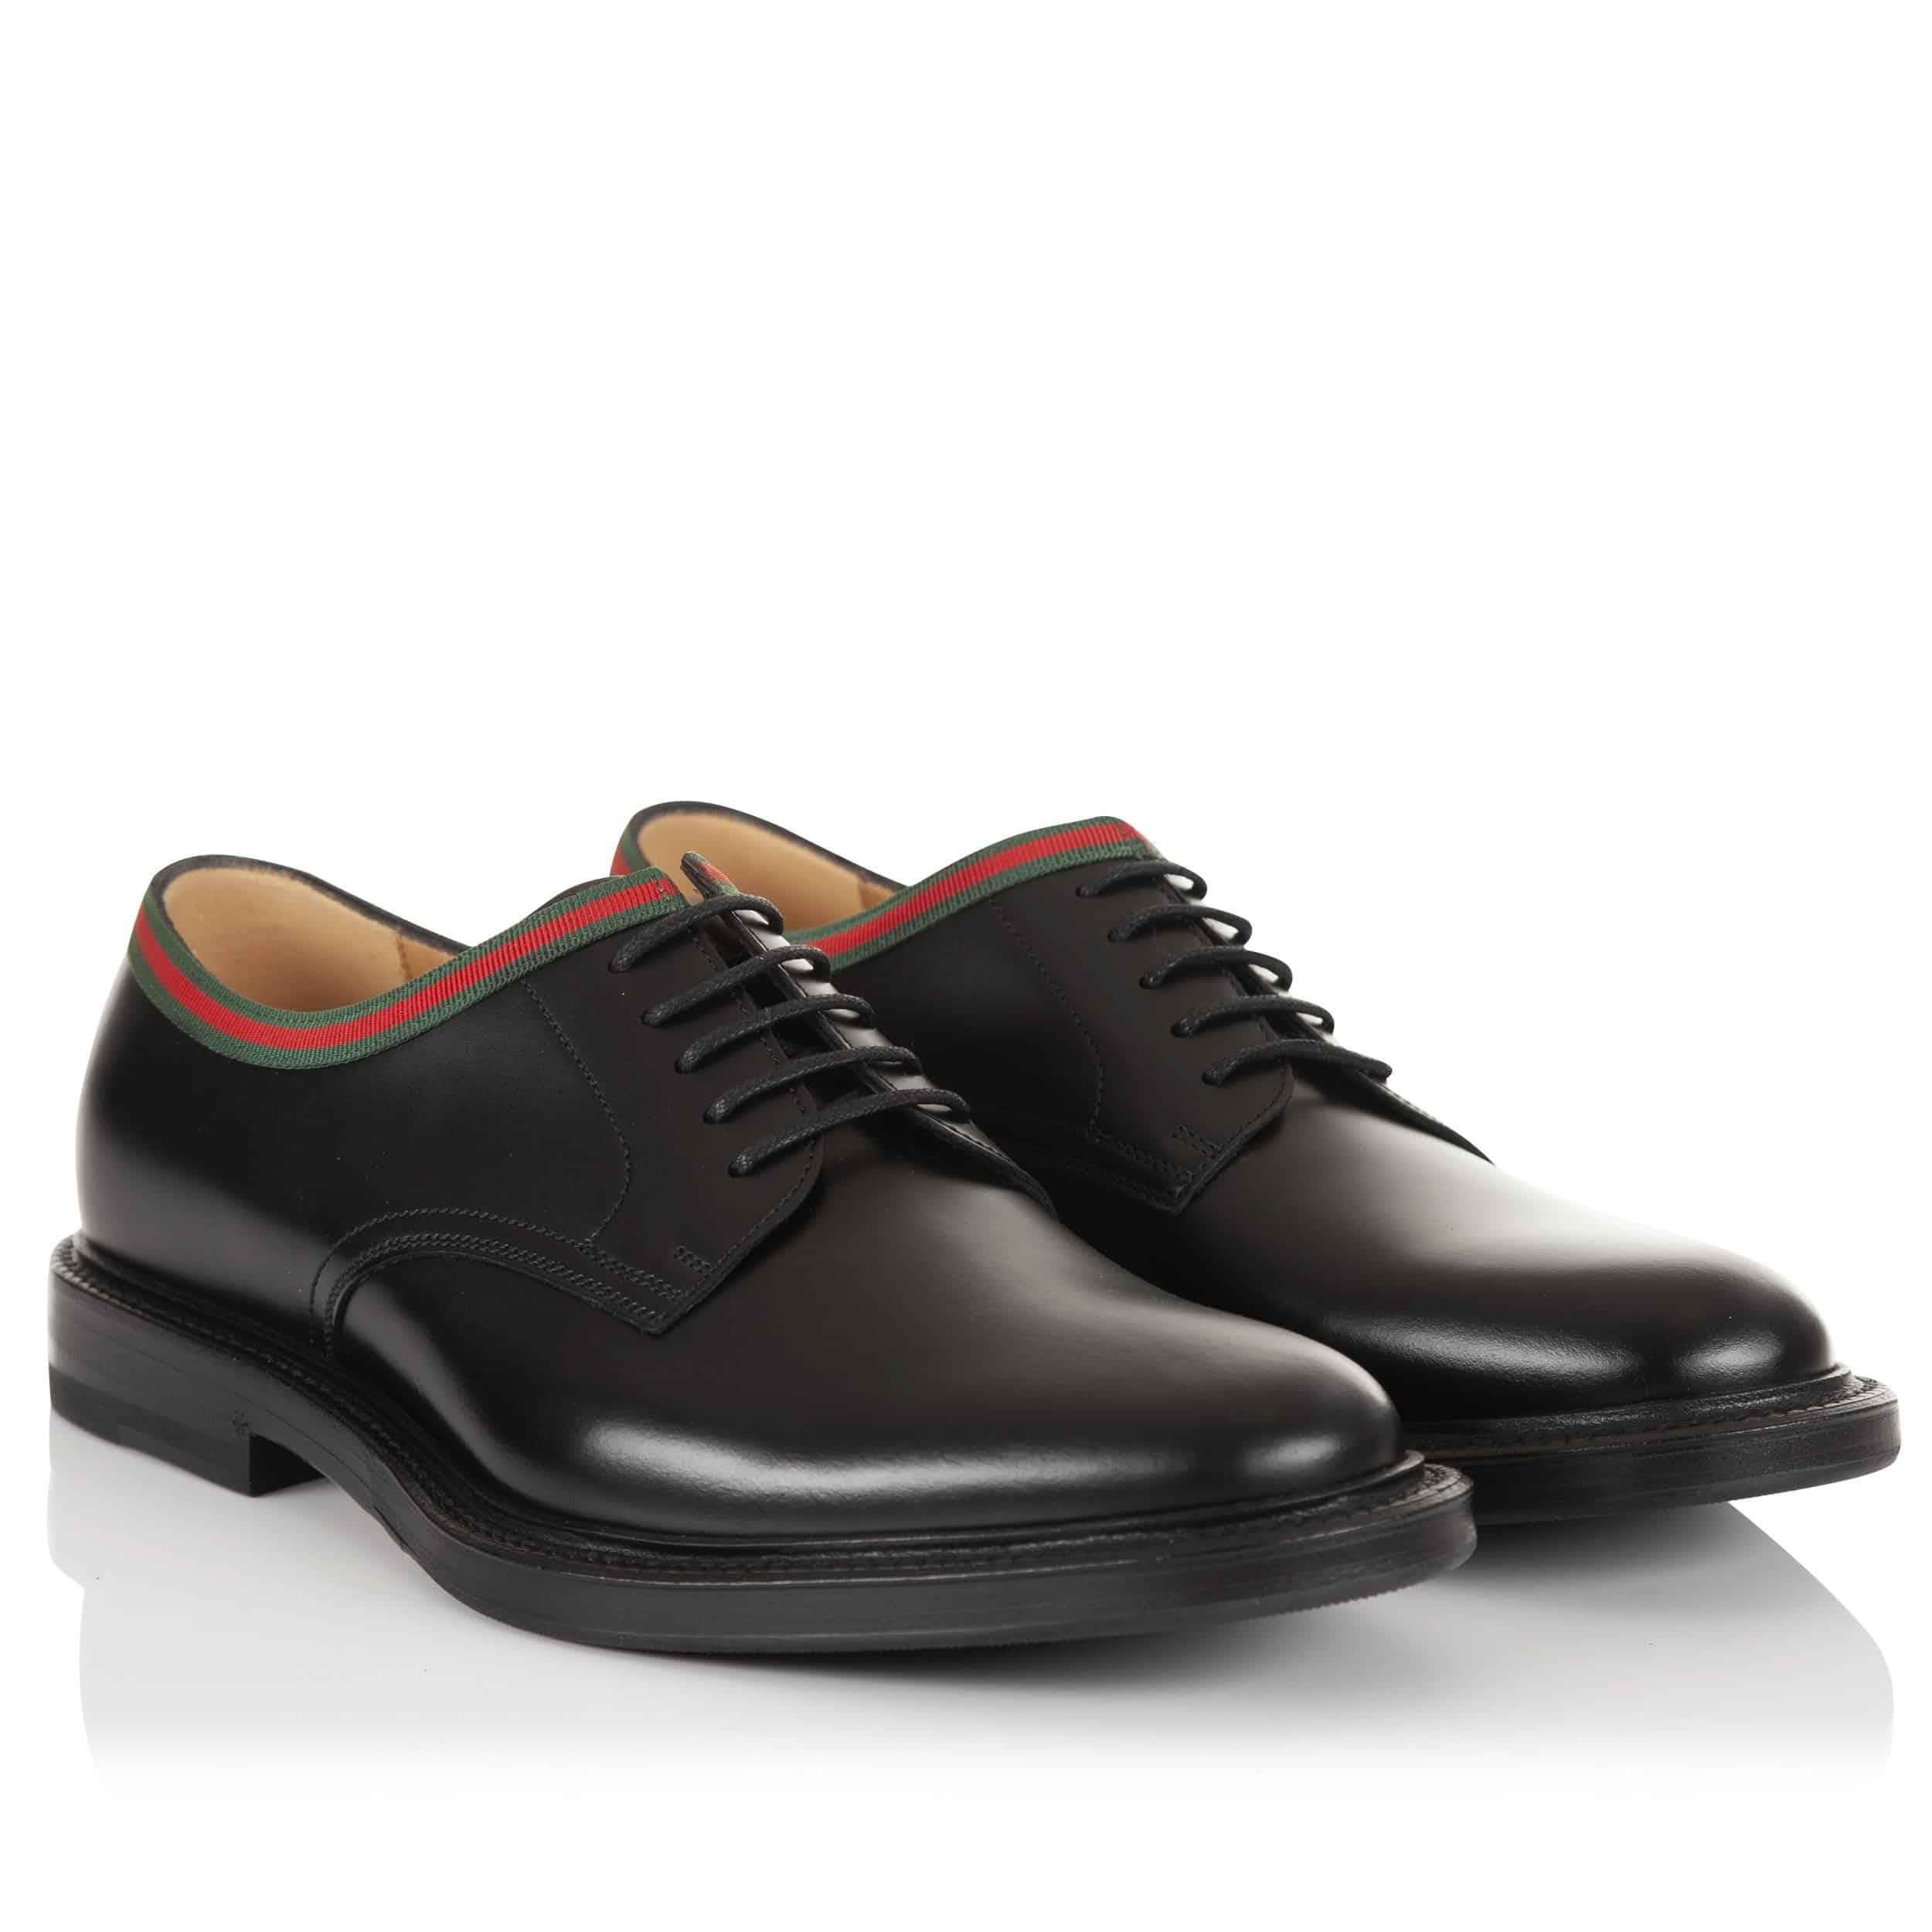 Sesuaikan-tema-acara-dengan-model-sepatu